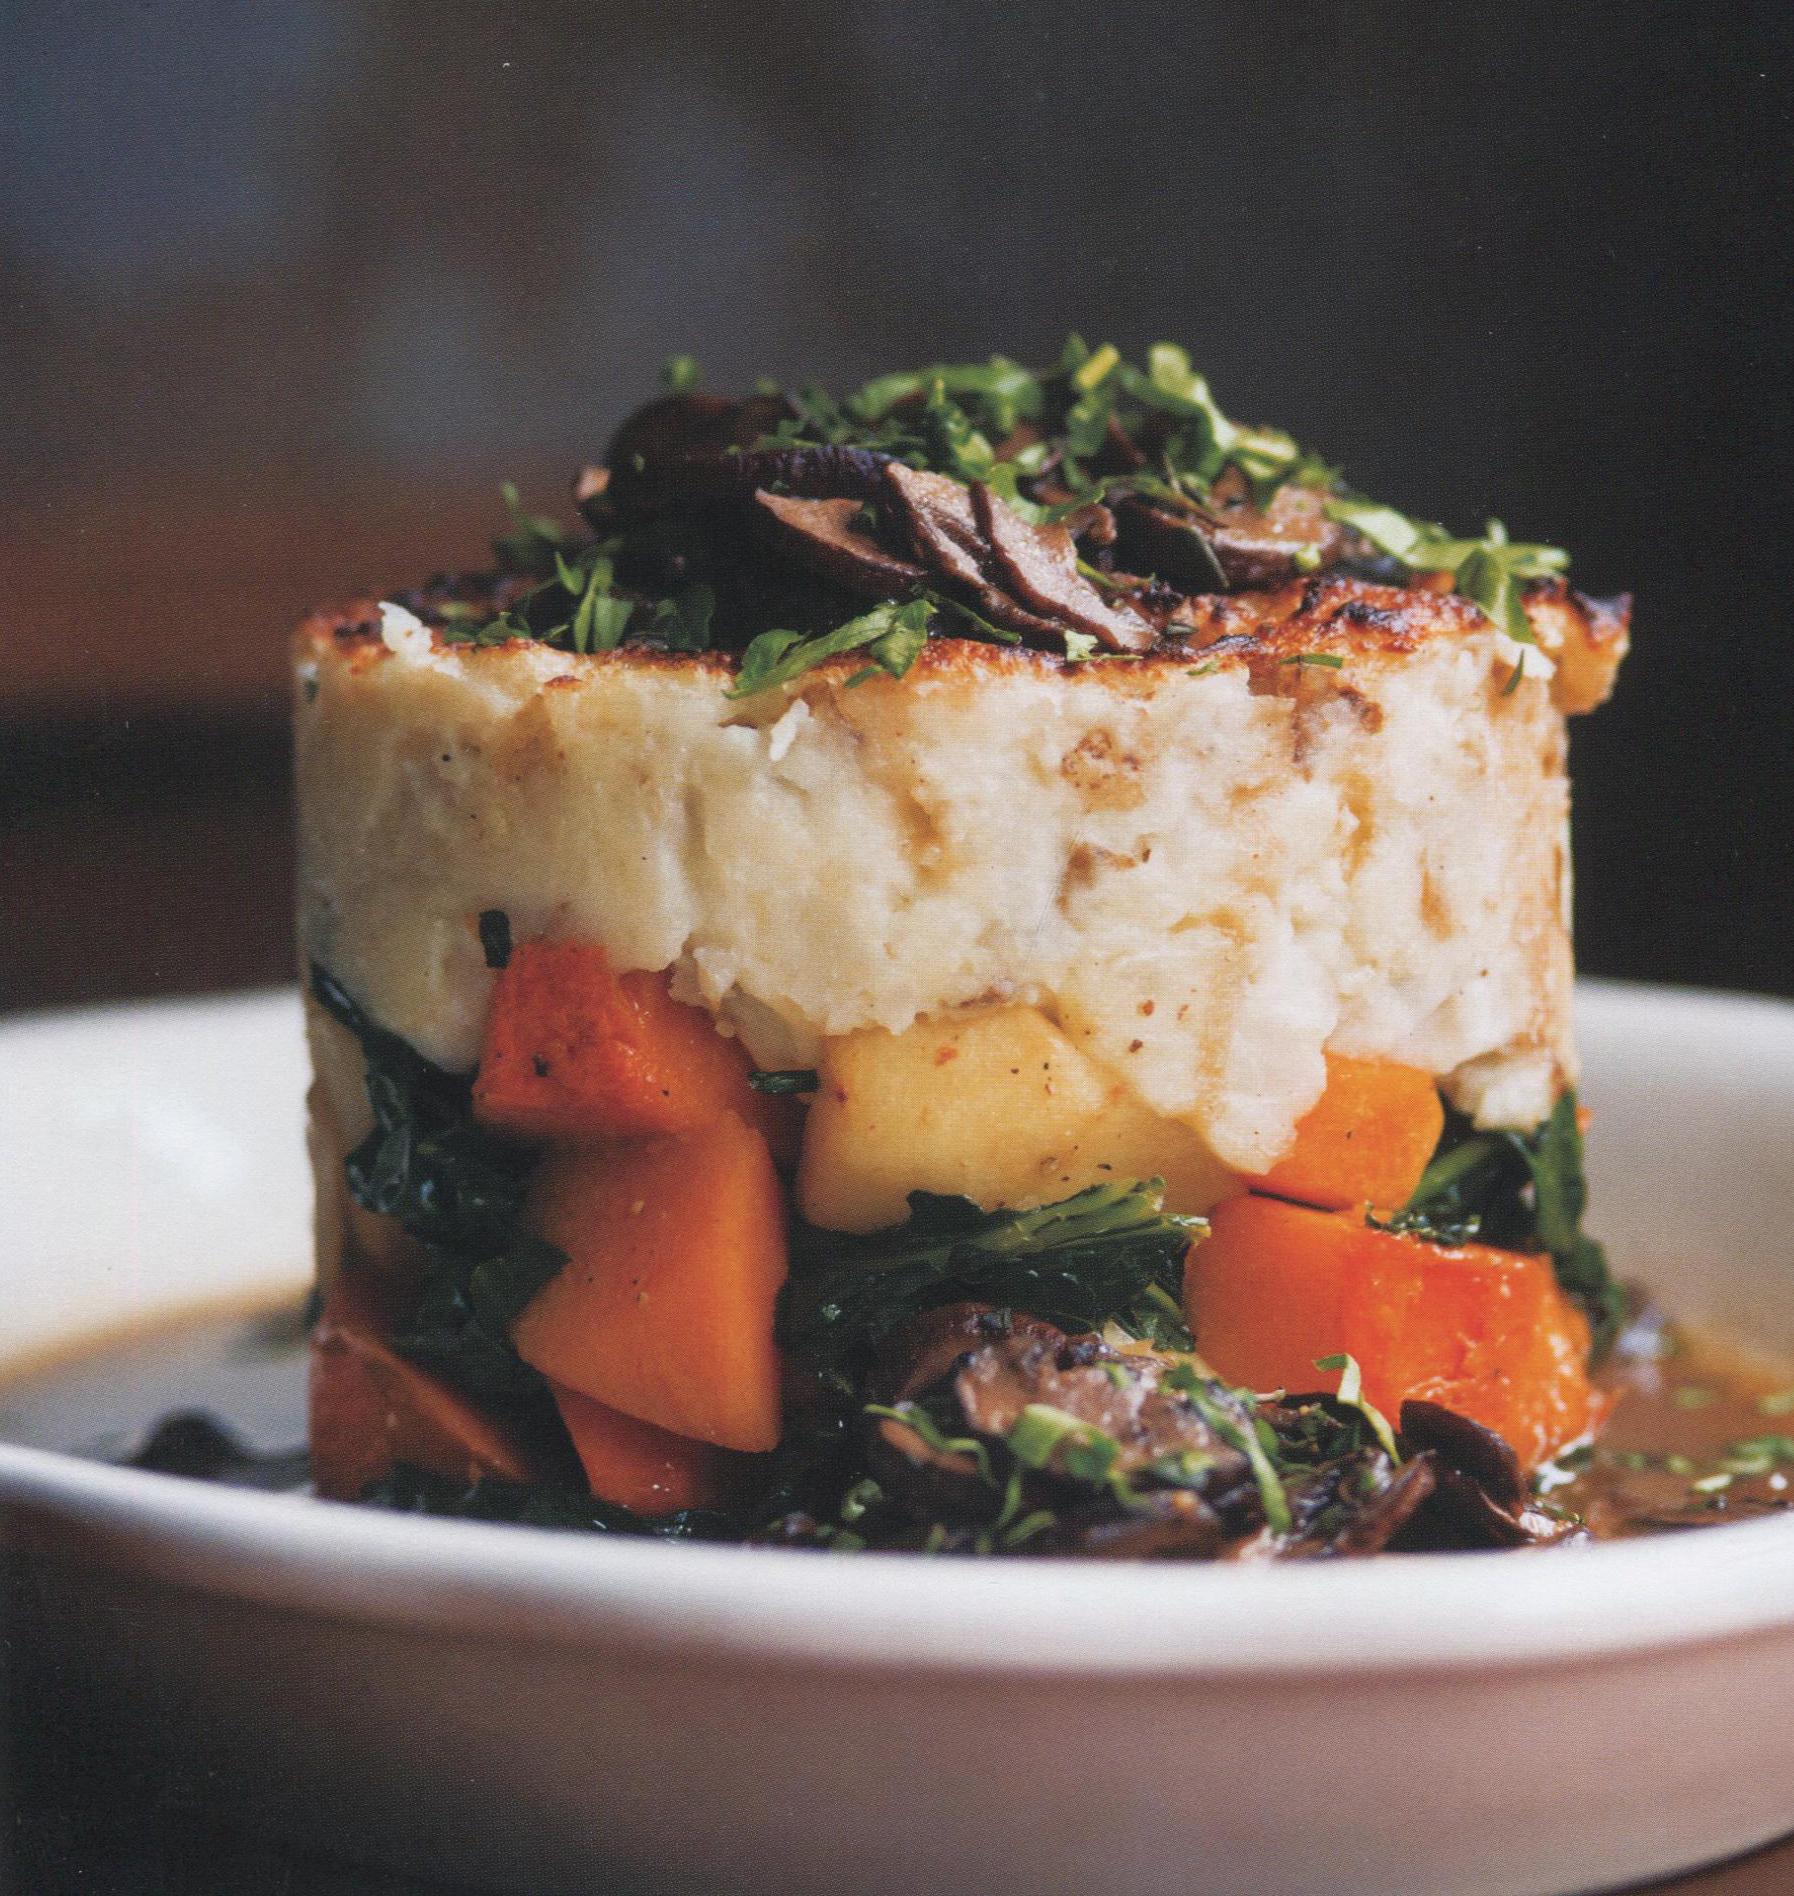 TBT Recipe: Vegetable Shepherd's Pie with Mushroom Sauce